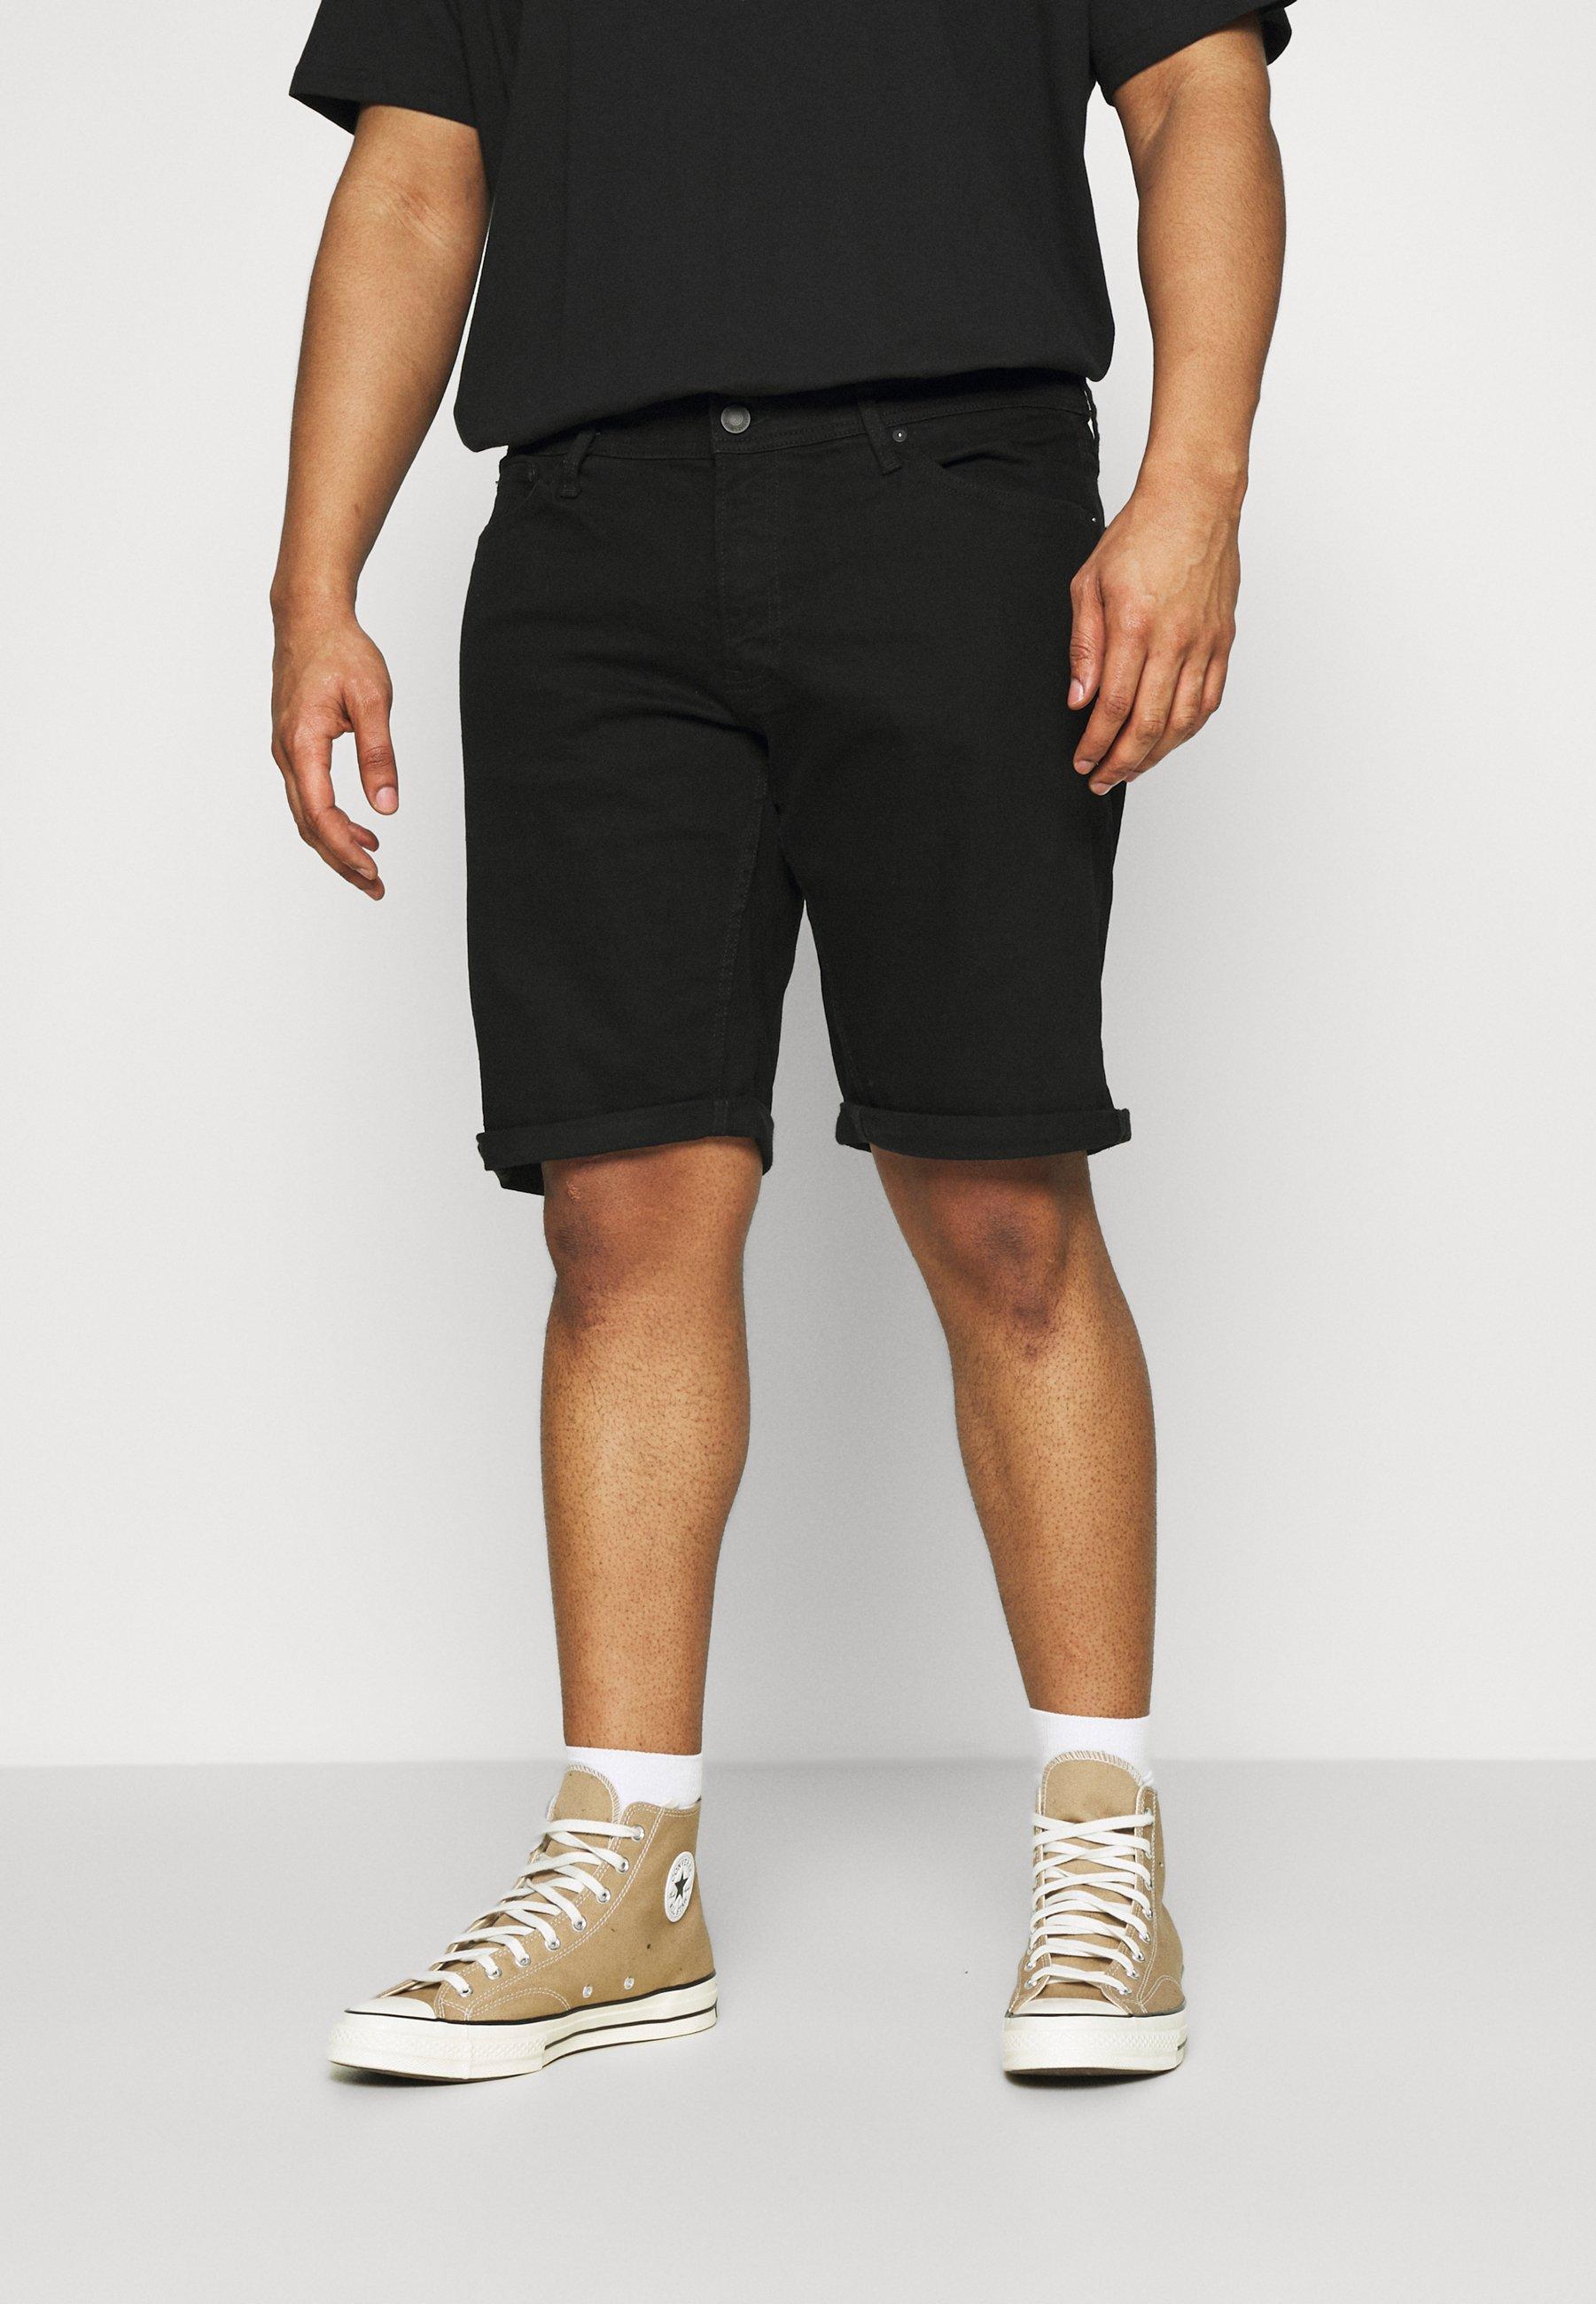 Homme JJIRICK JJORIGINAL - Short en jean